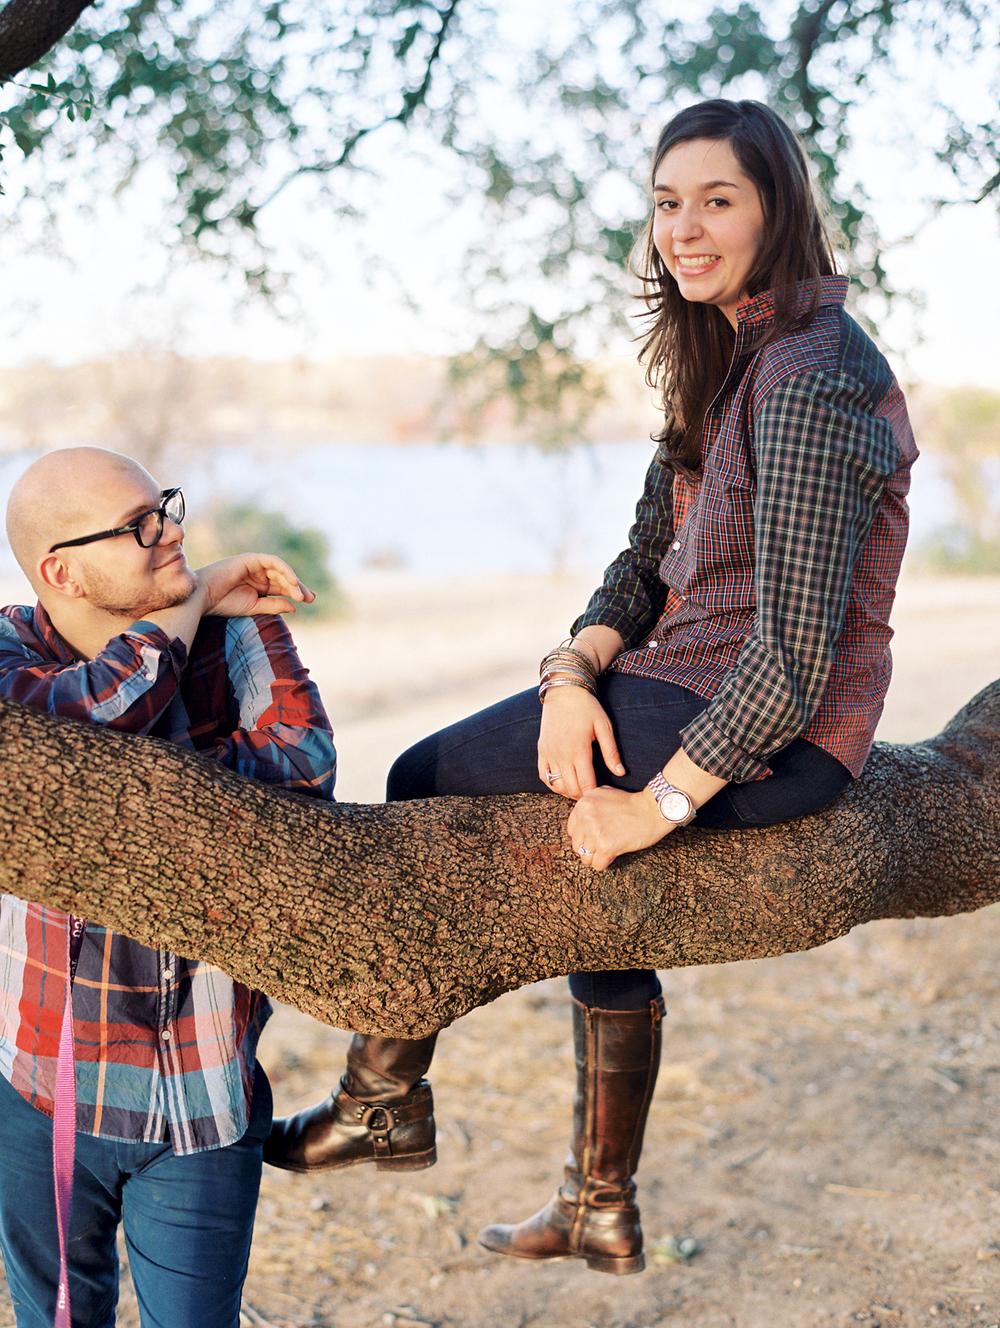 Family Portrait Session at White Rock Lake | Danielle M. Sabol, Dallas Texas Fine Art Portrait Photographer